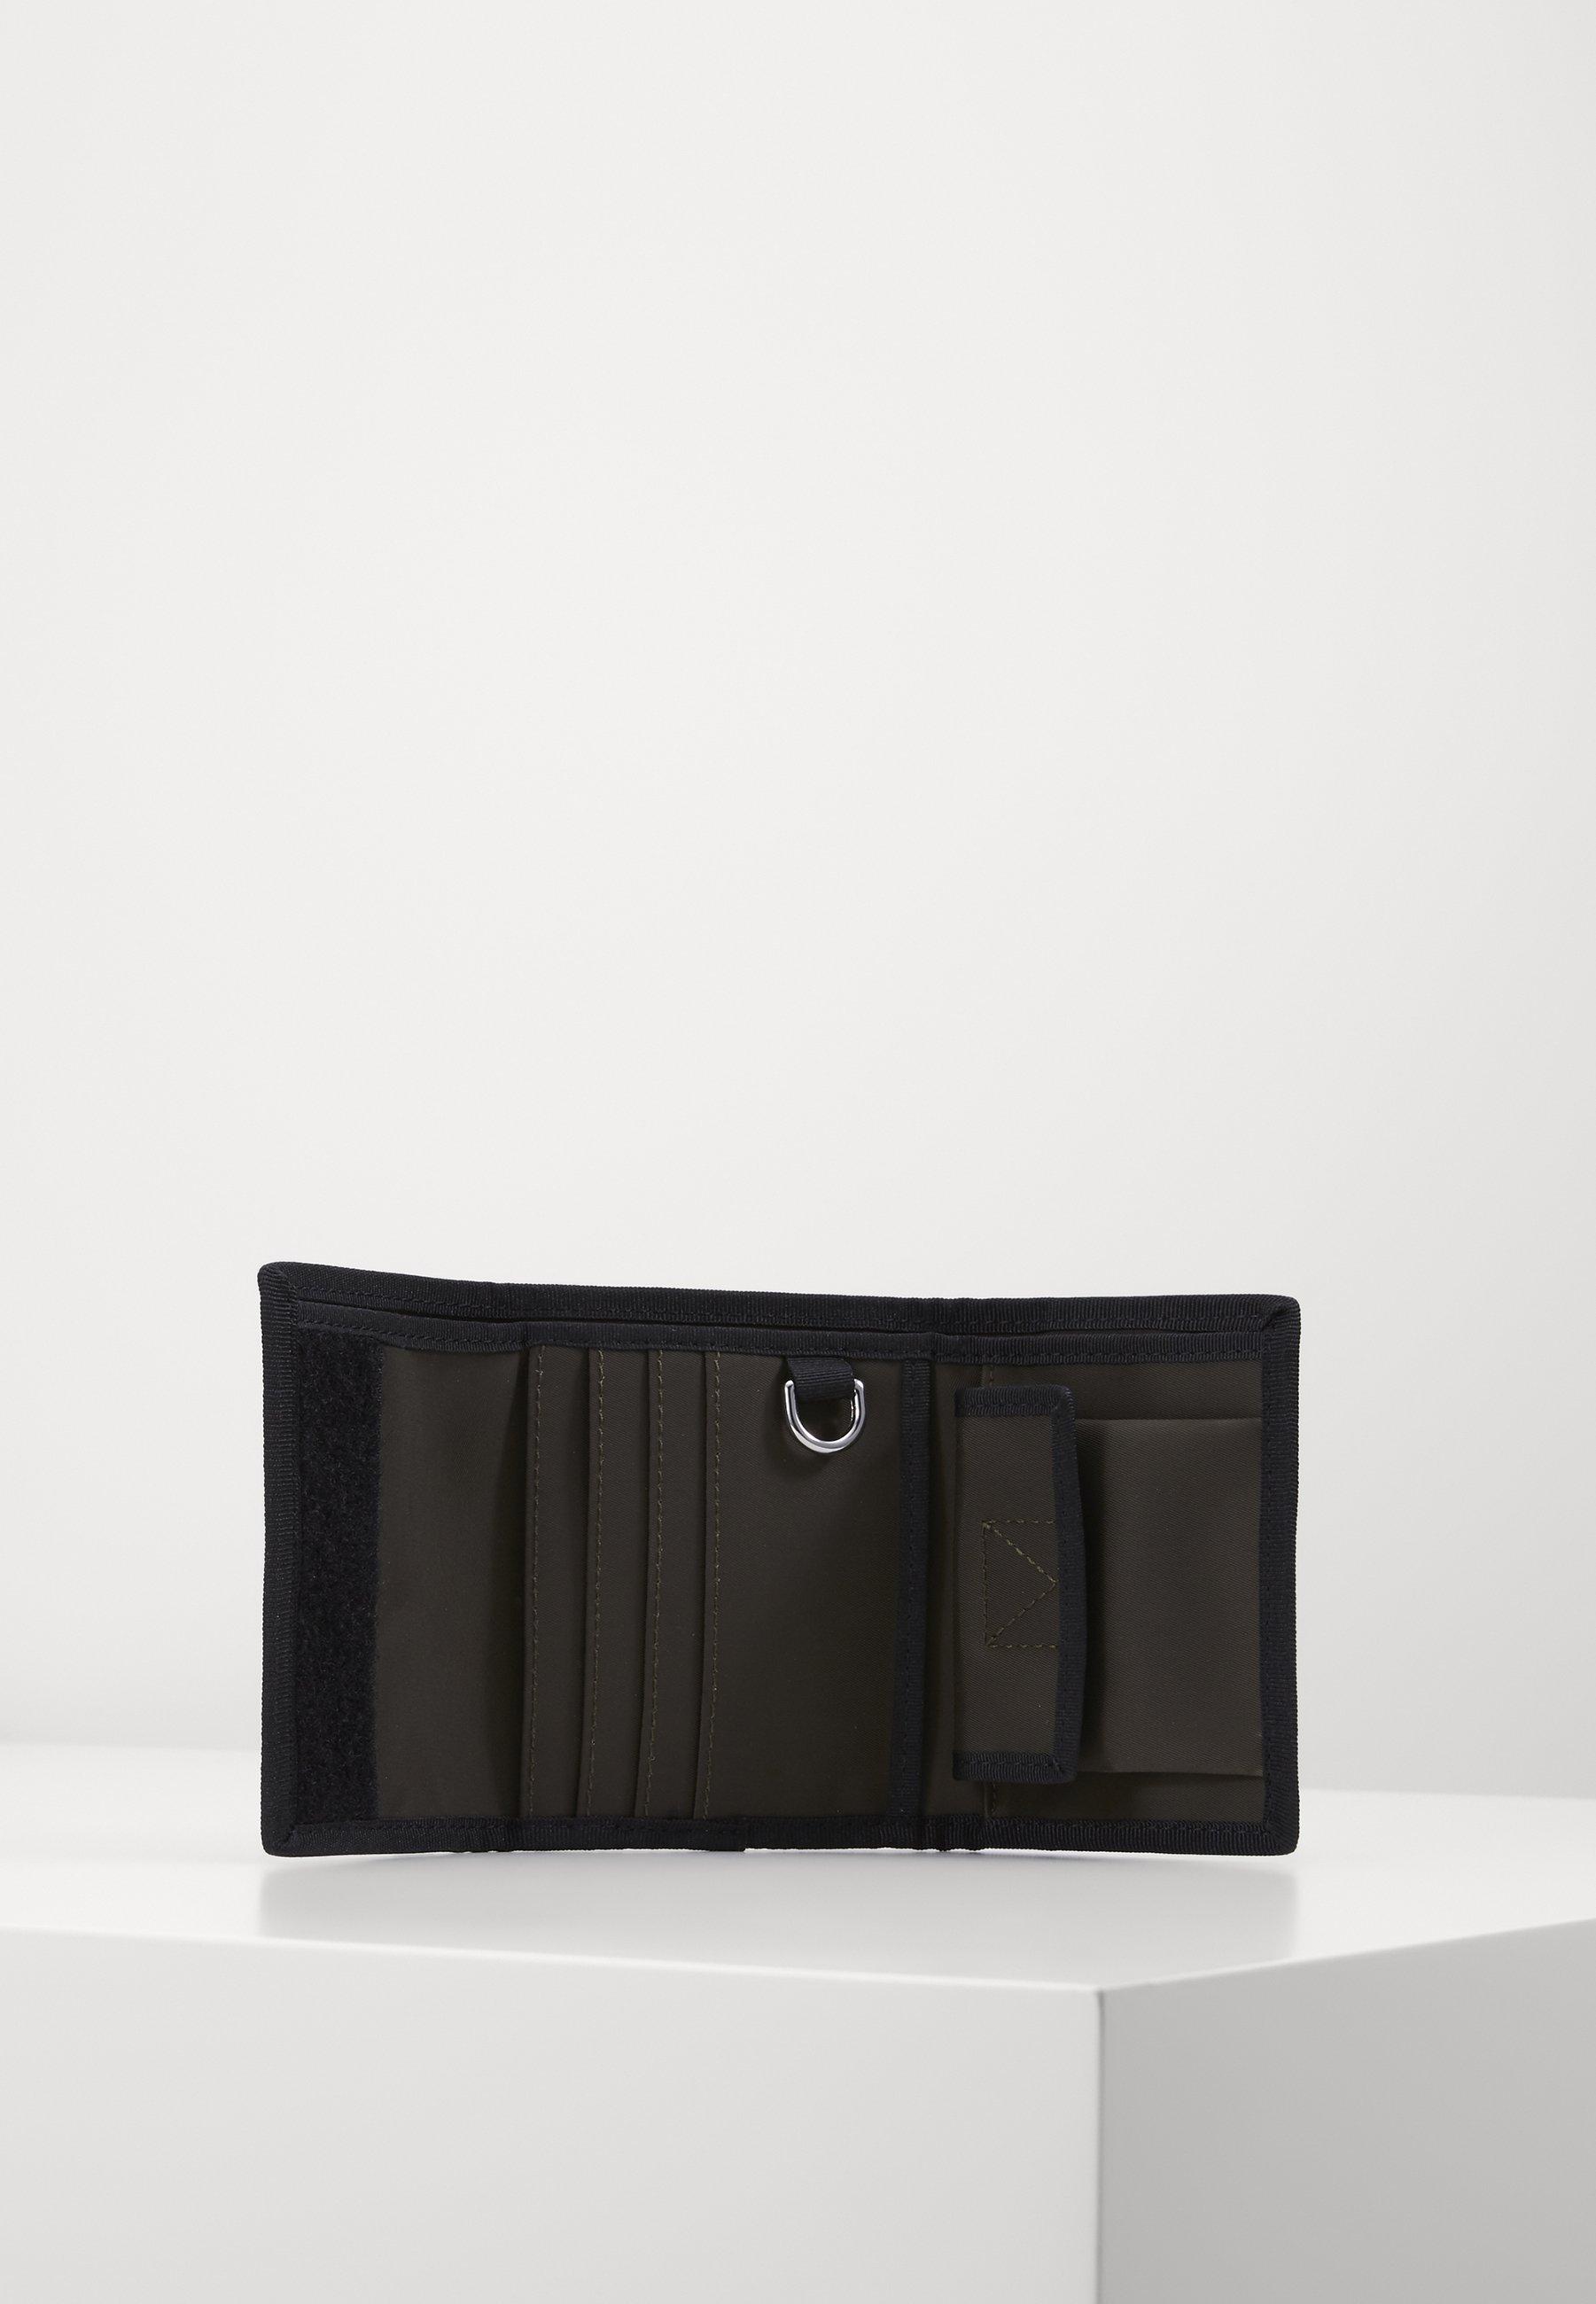 Cheapest Outlet PS Paul Smith EXCLUSIVE MONKEY CORNER ZIP - Wallet - black | men's accessories 2020 jYpi0